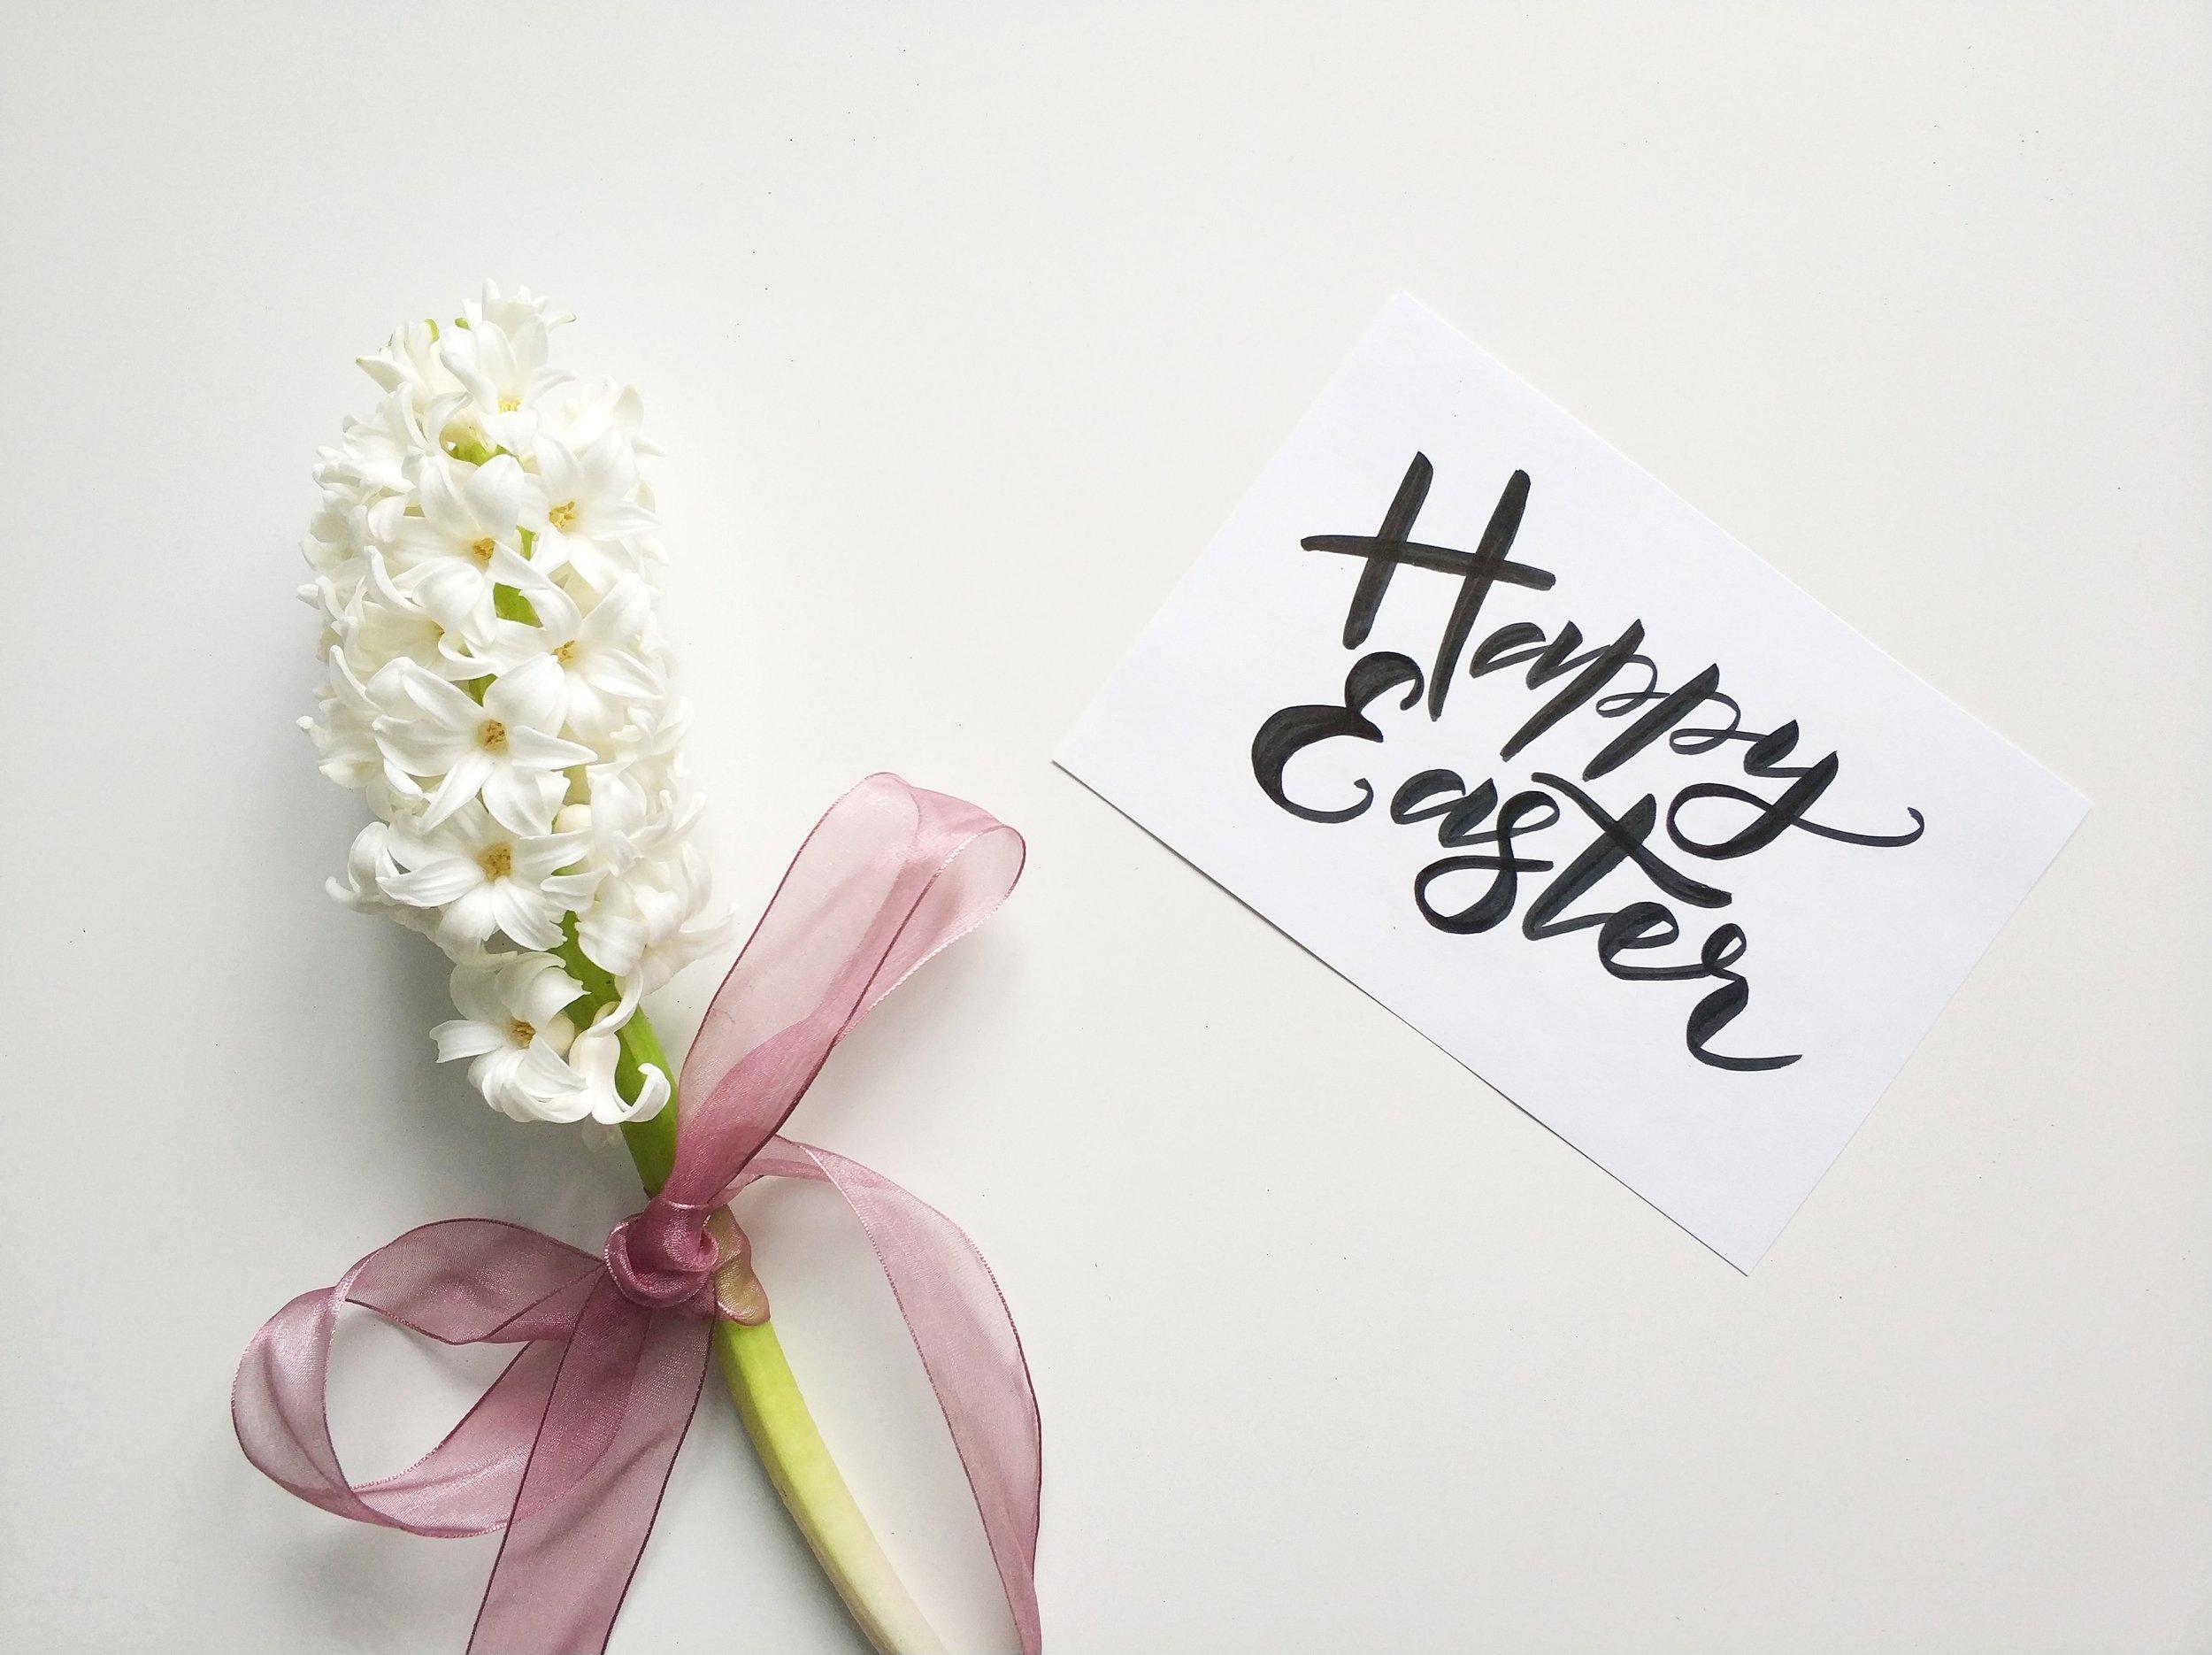 Leonardslee Easter